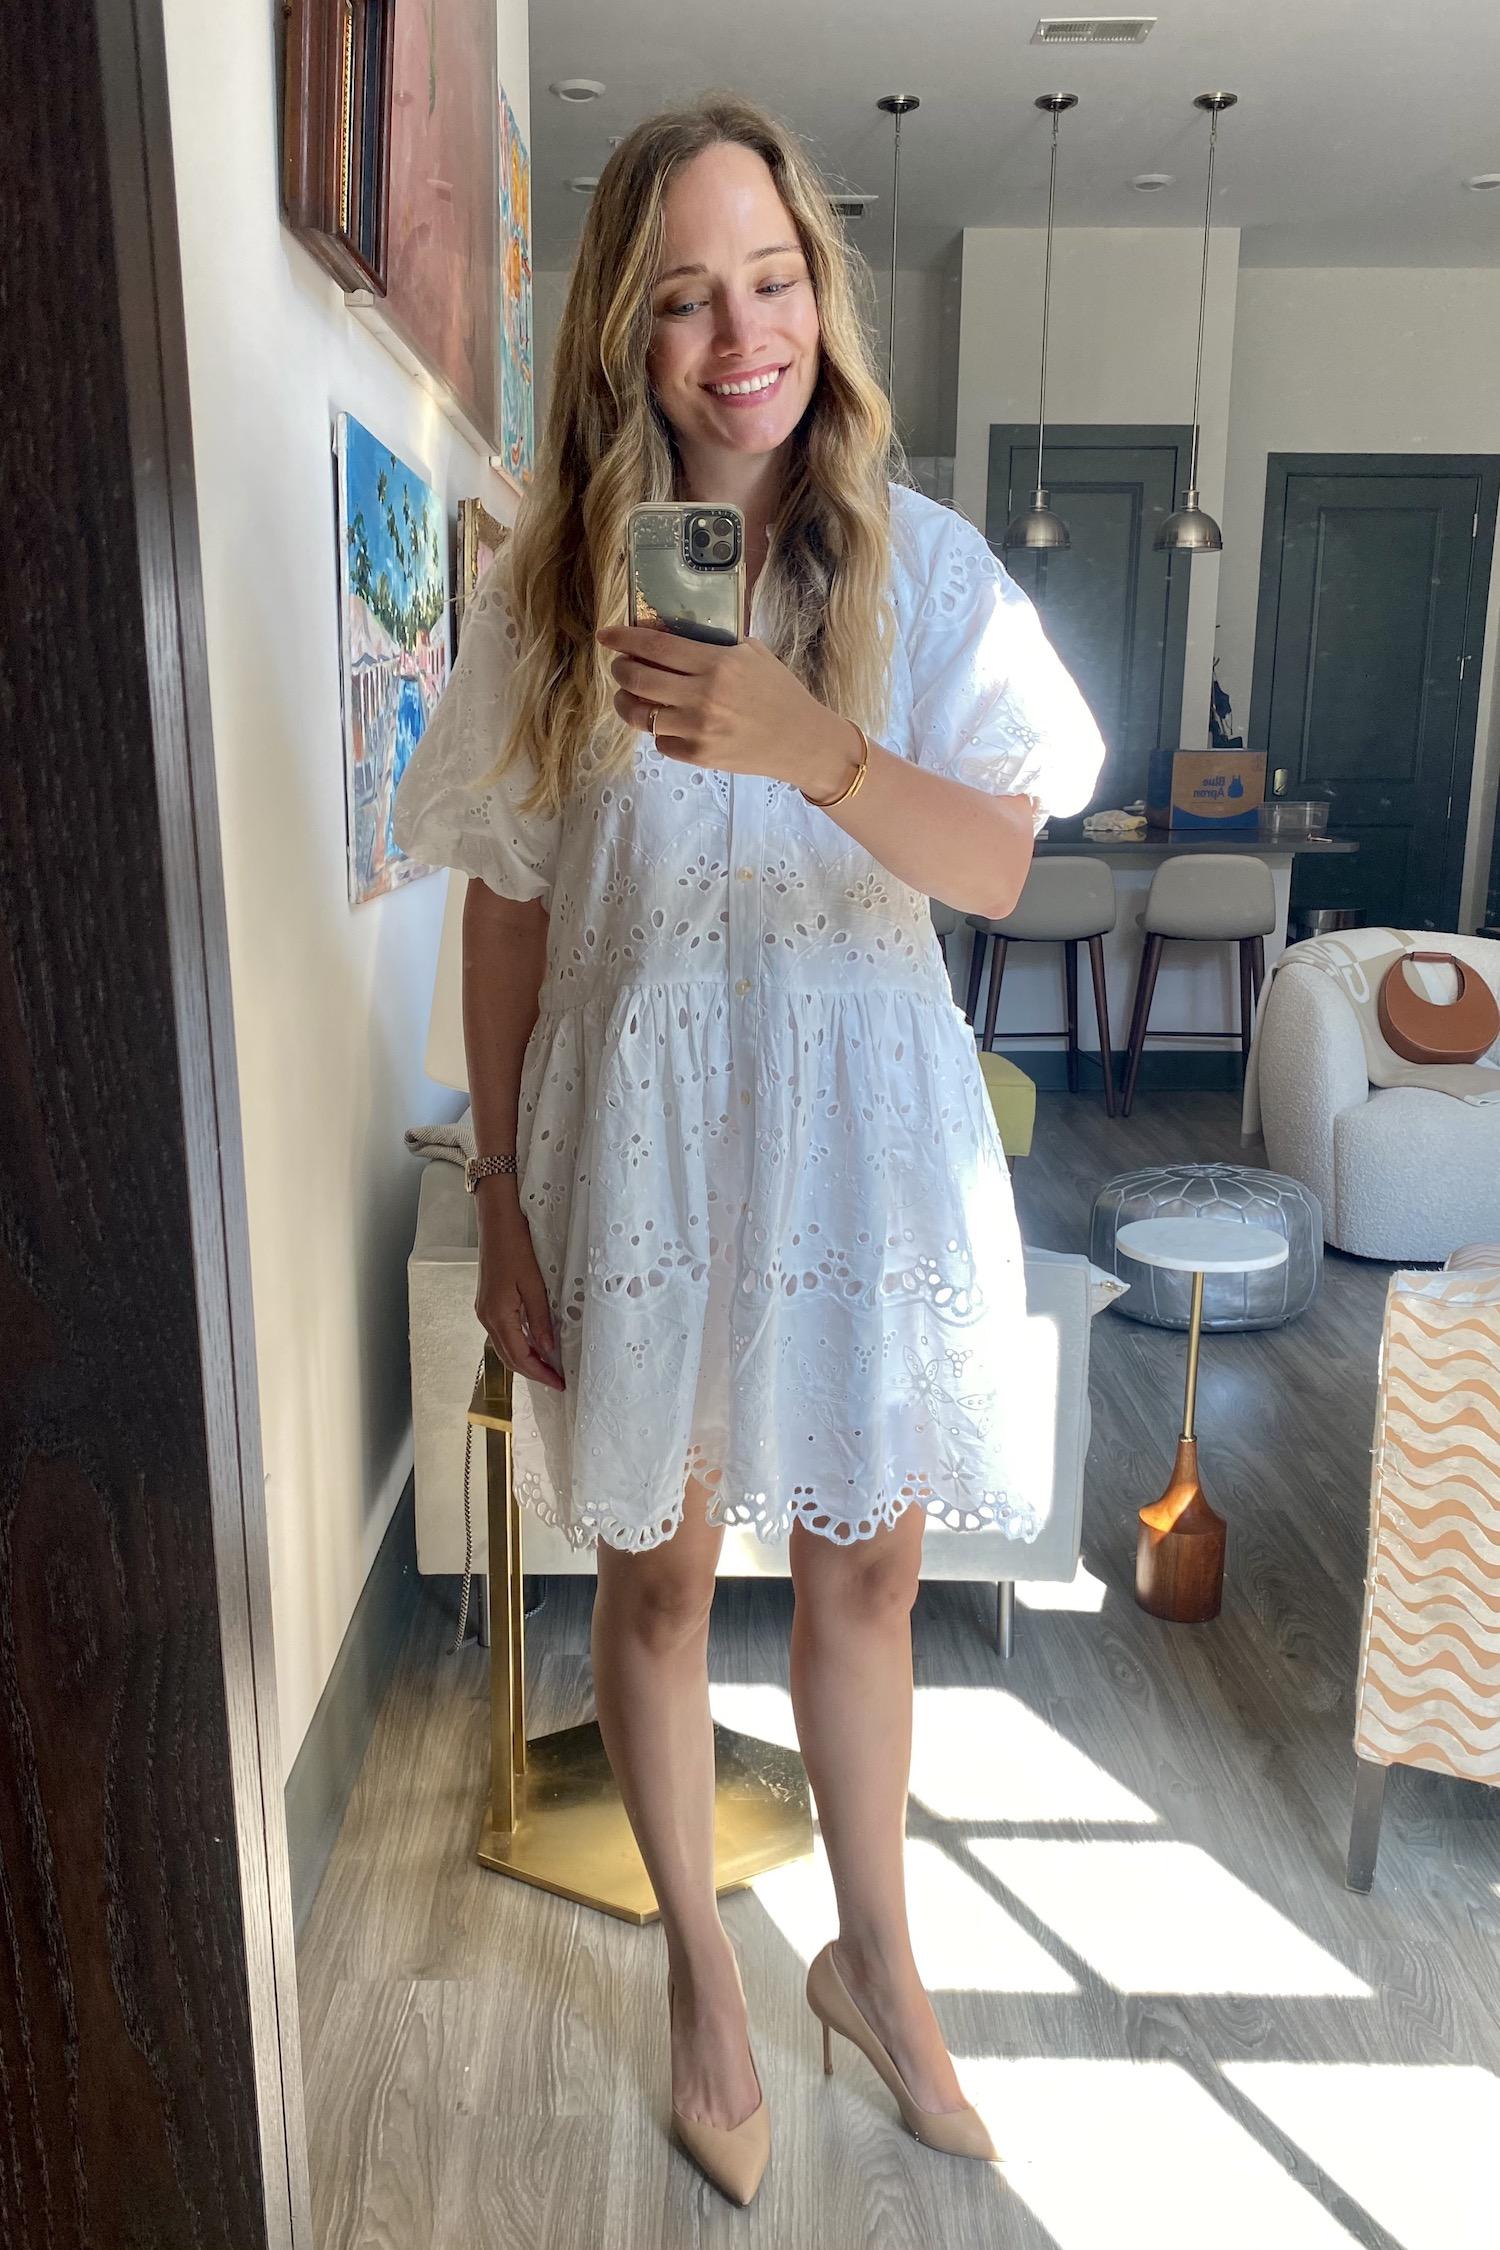 cutest Anthropologie eyelet dress | What I Wore Last Week 6.2.21